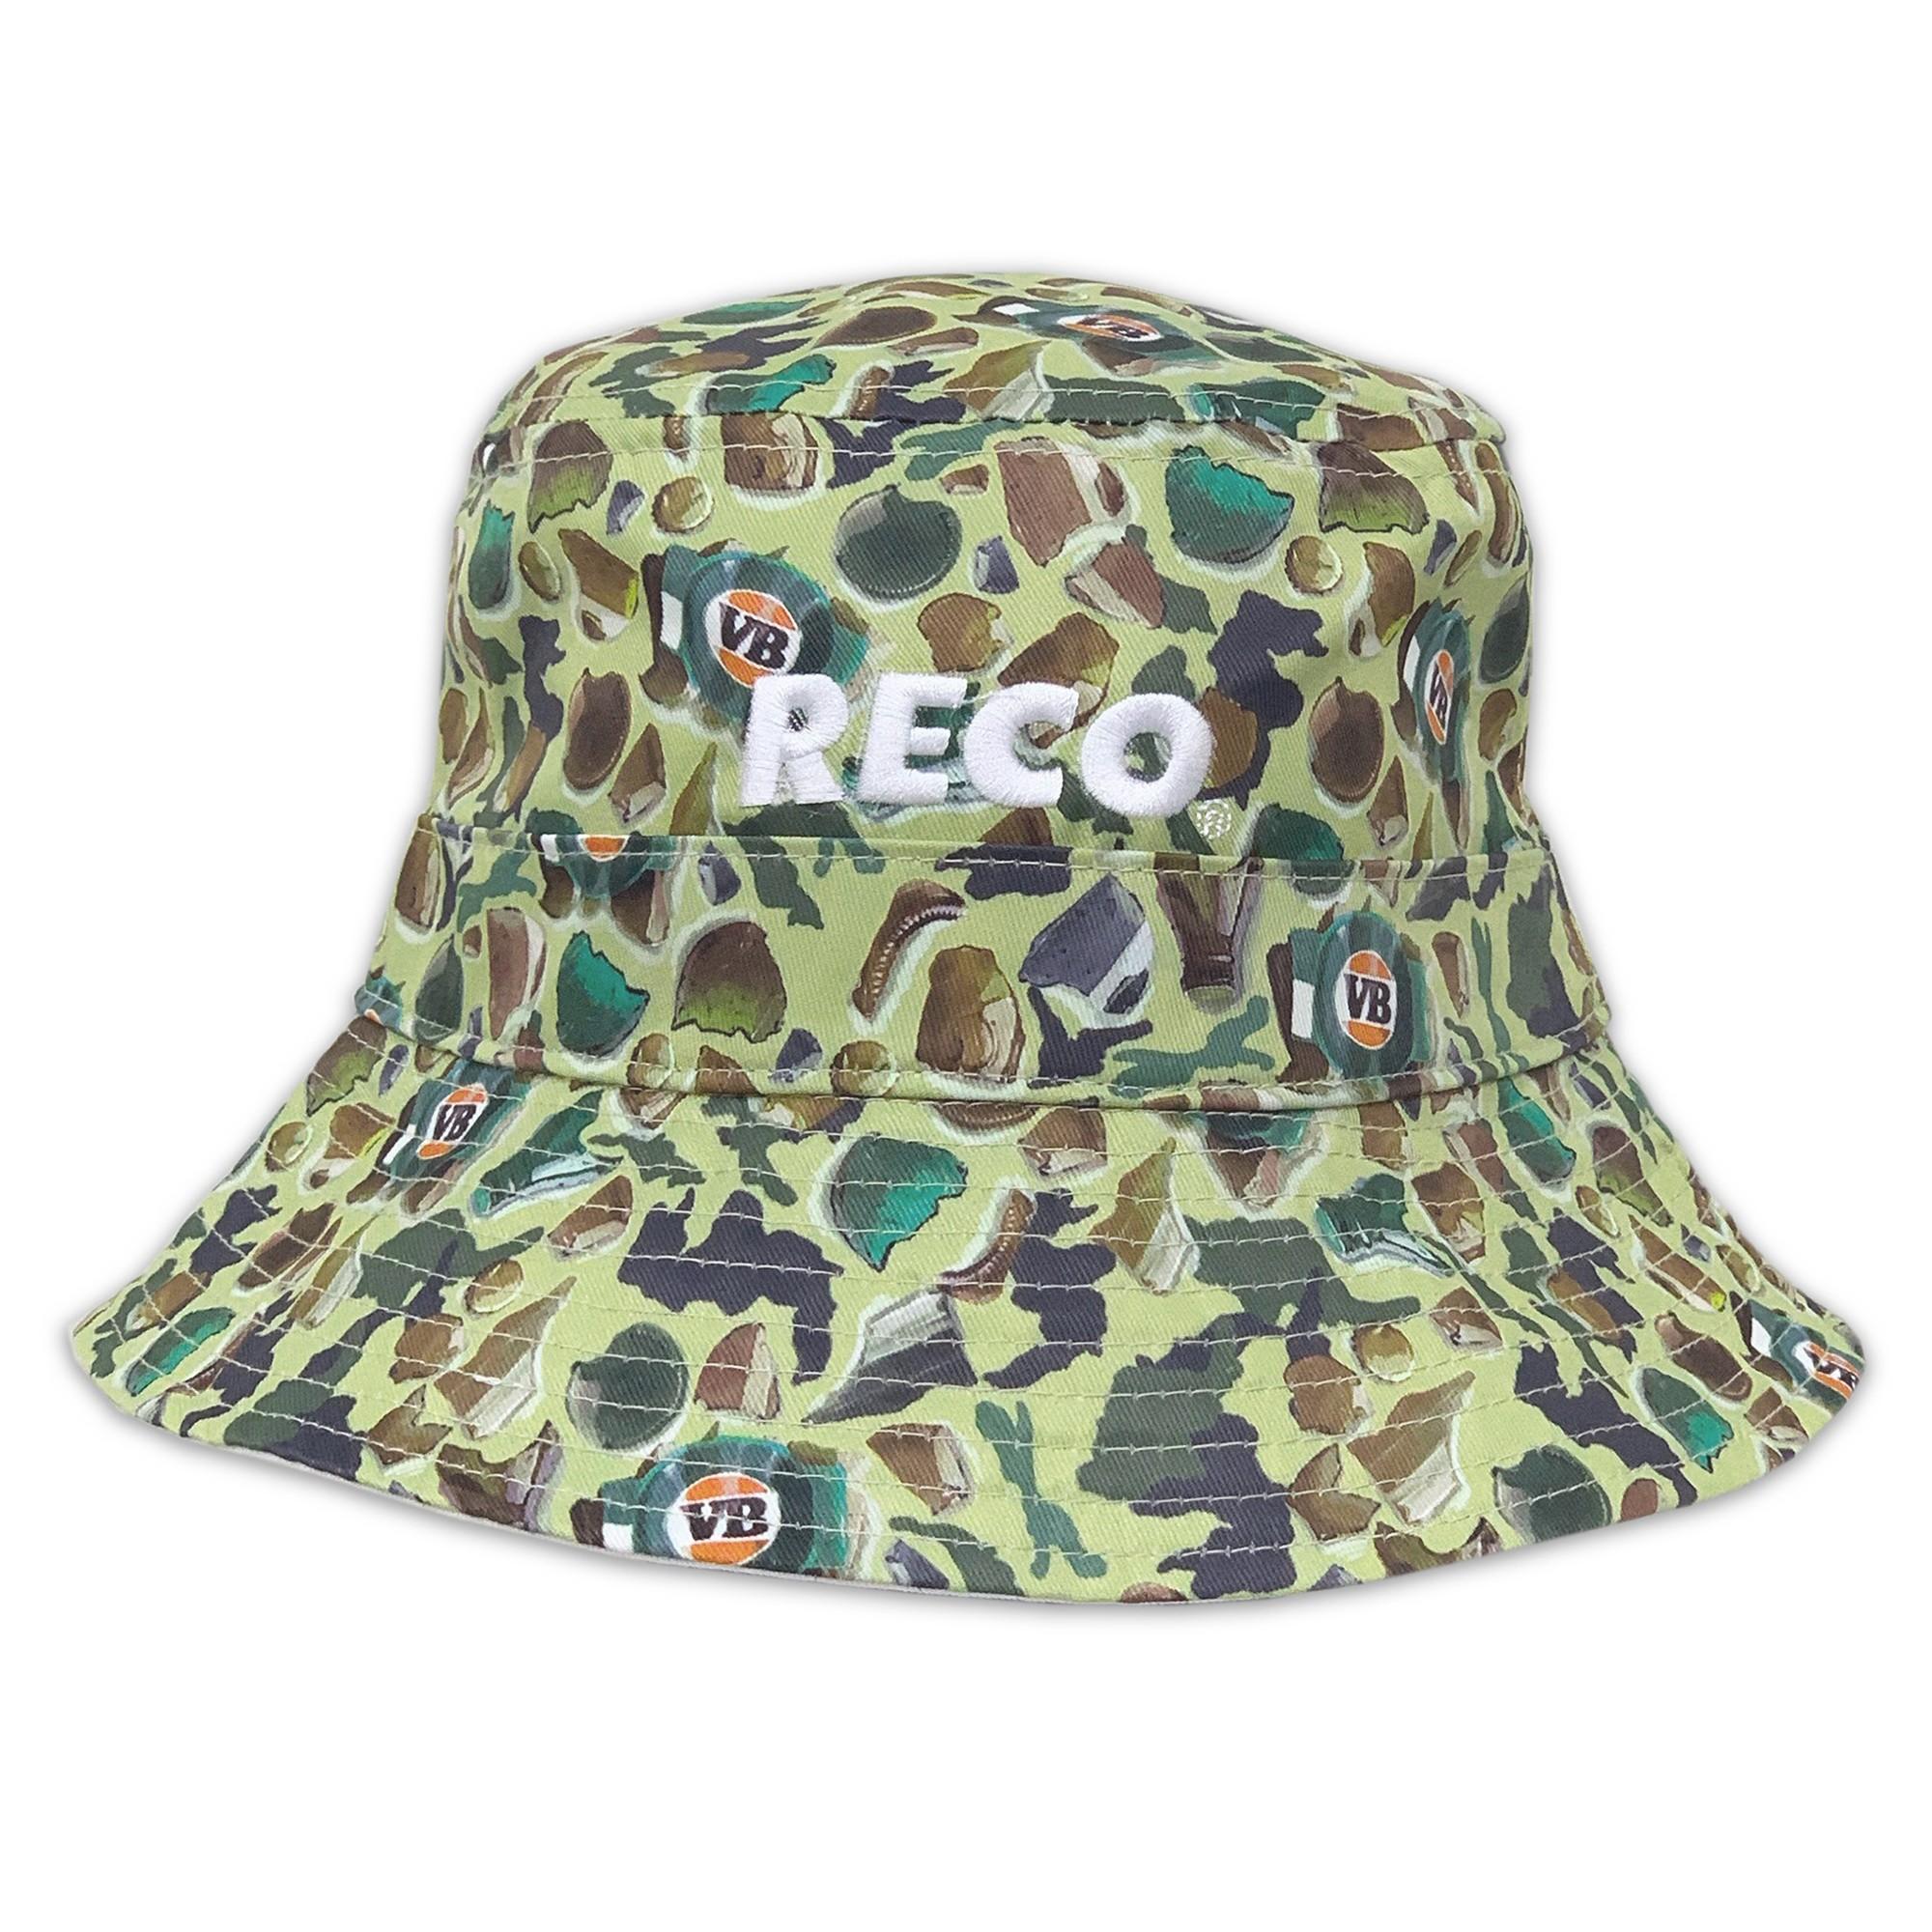 SMASHED CAMO BUCKET HAT